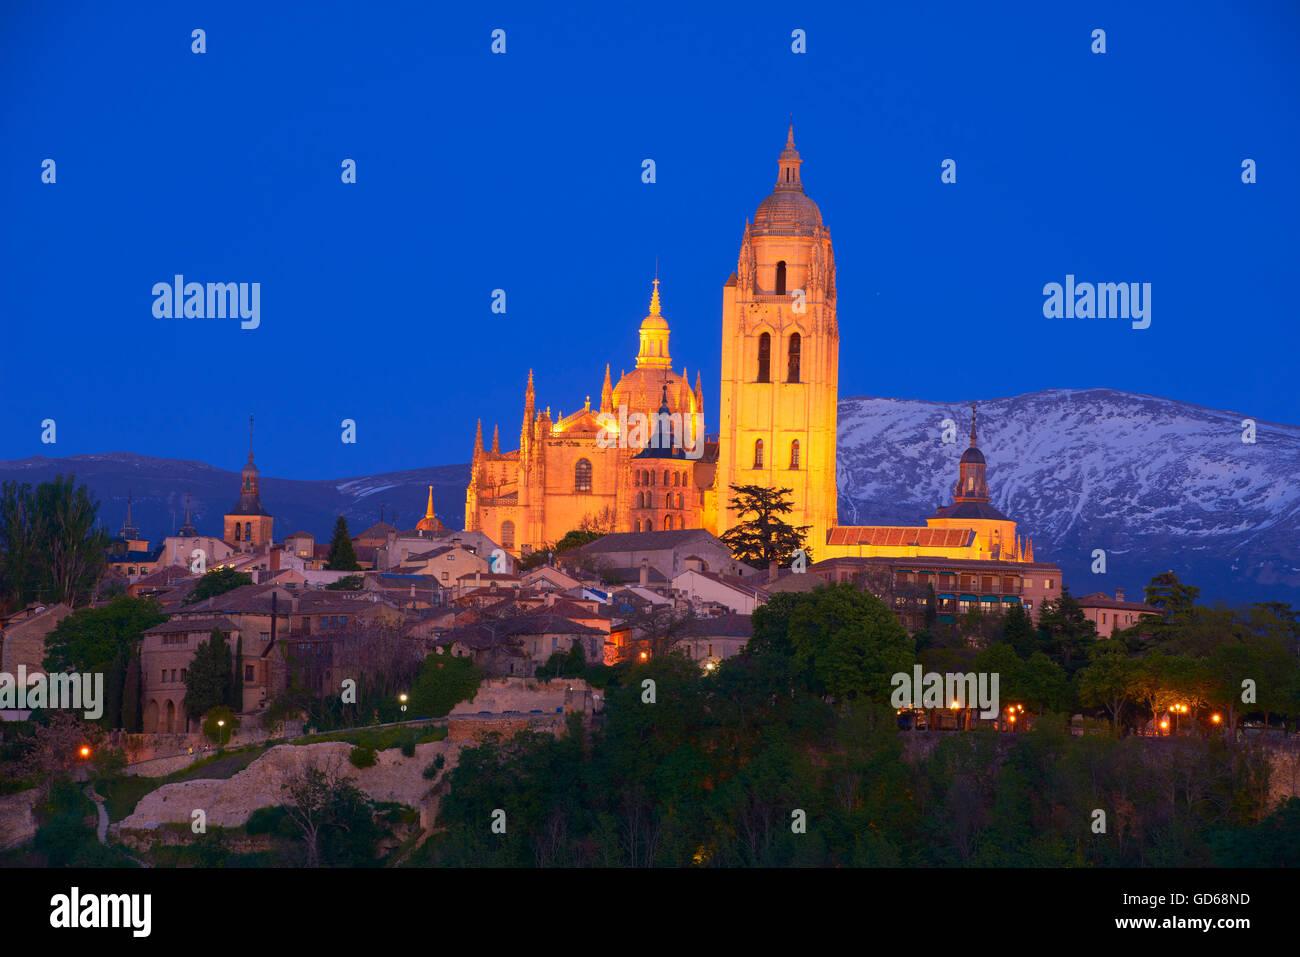 Cathedral at Dusk, Segovia, Castilla-Leon, Spain, - Stock Image